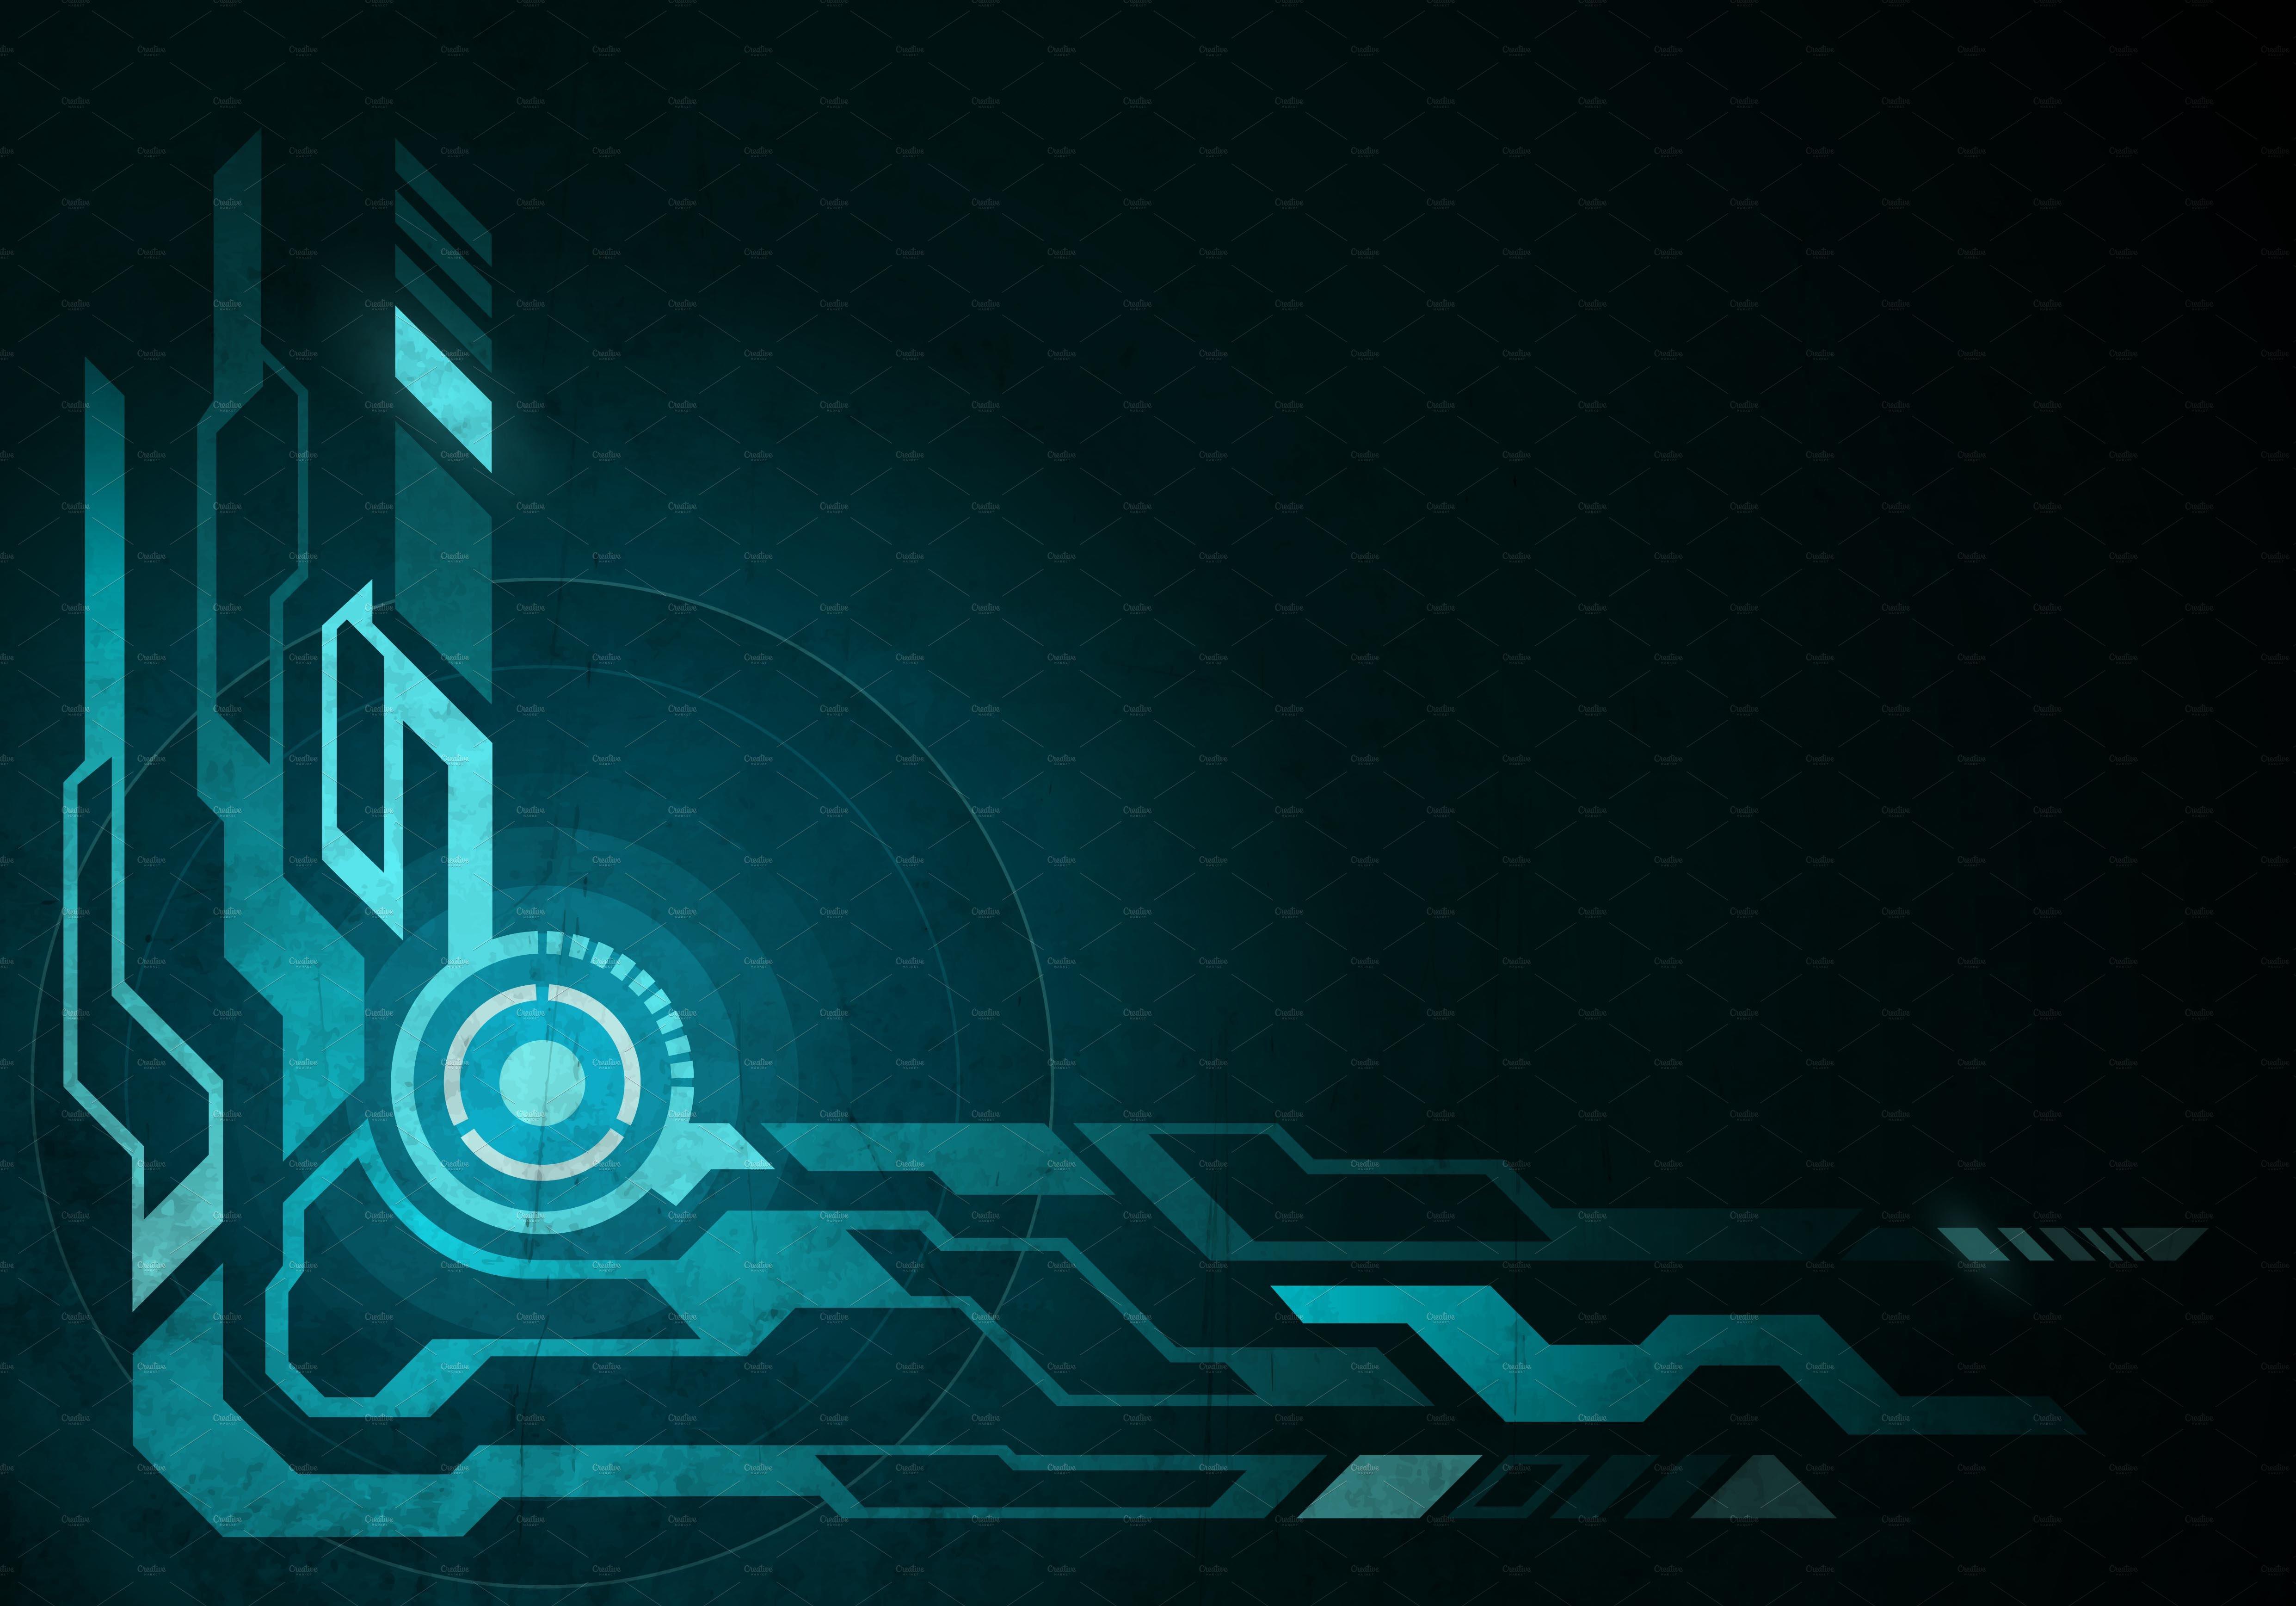 Creative Graphics Design Background: Techno Background